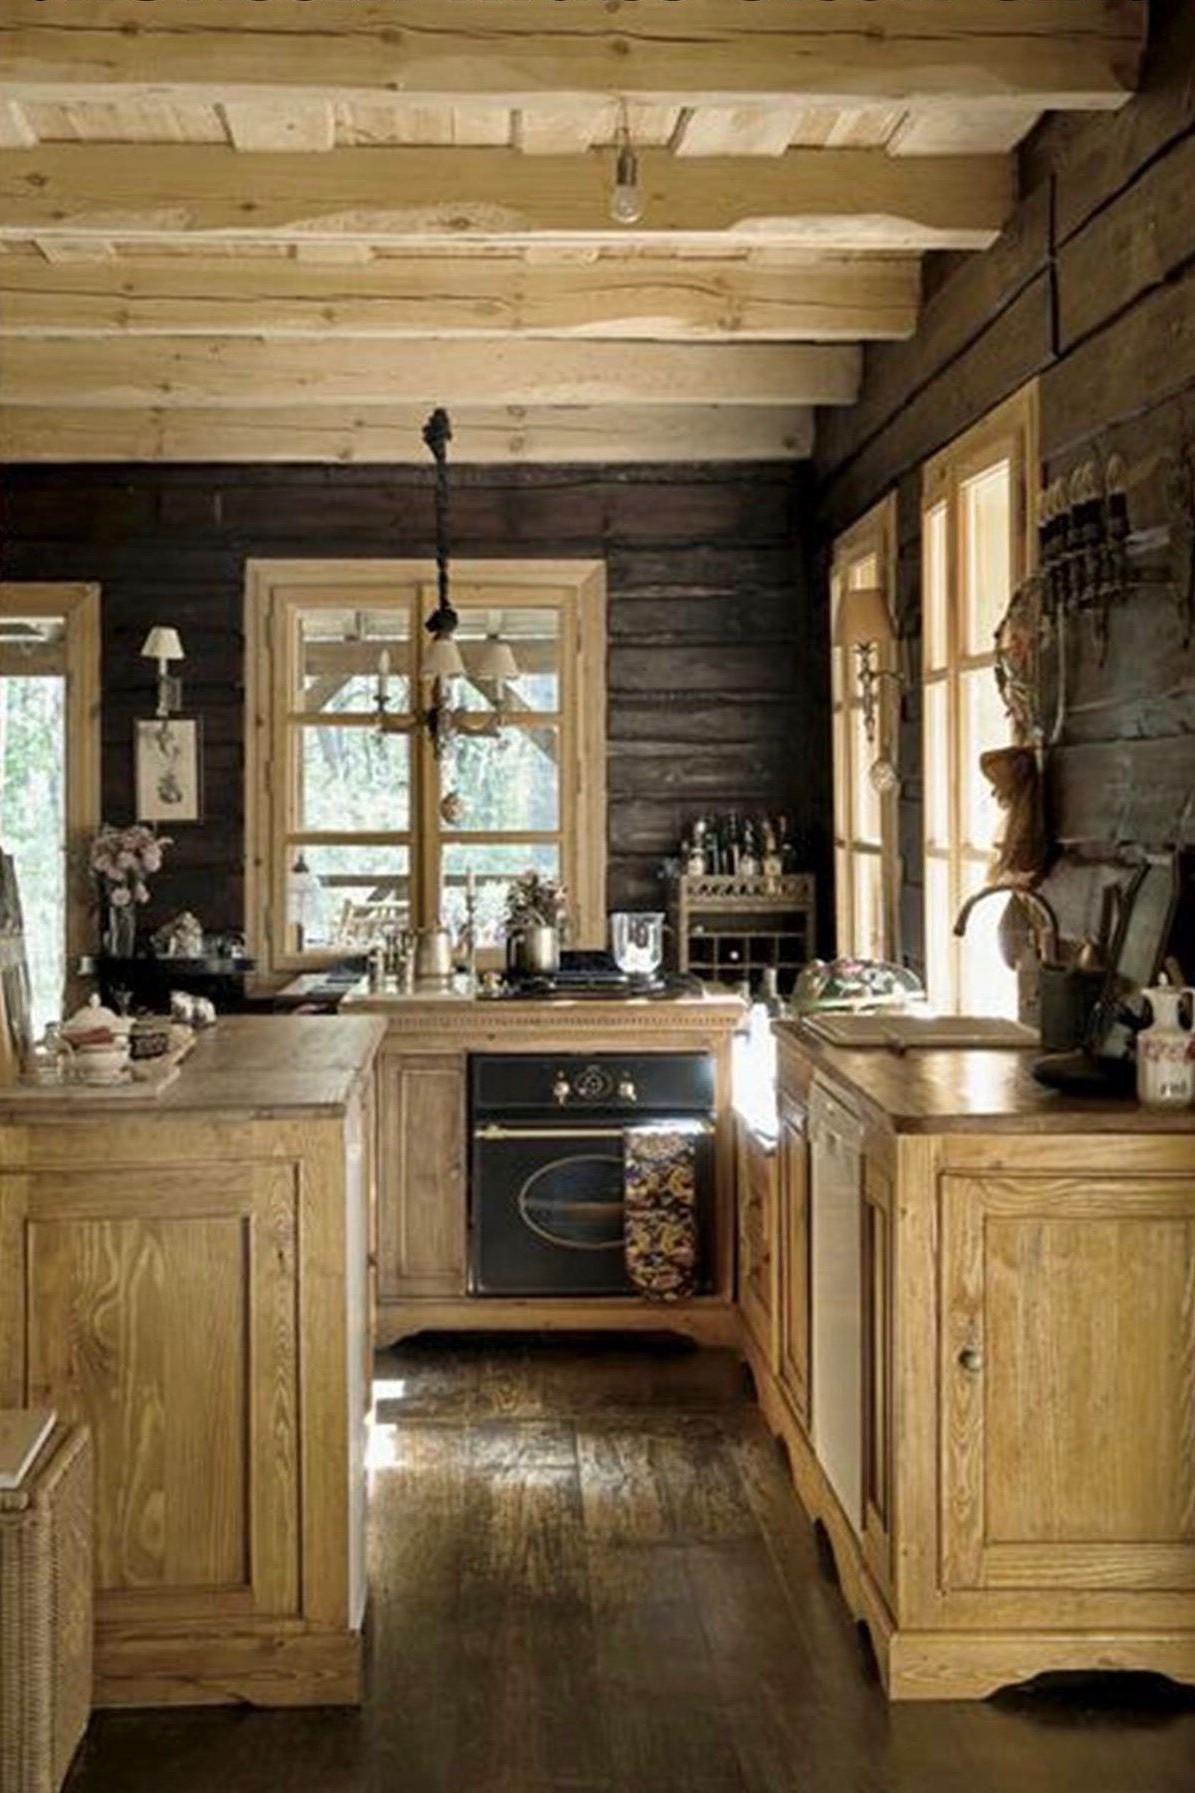 46 stylish rustic farmhouse kitchen ideas in